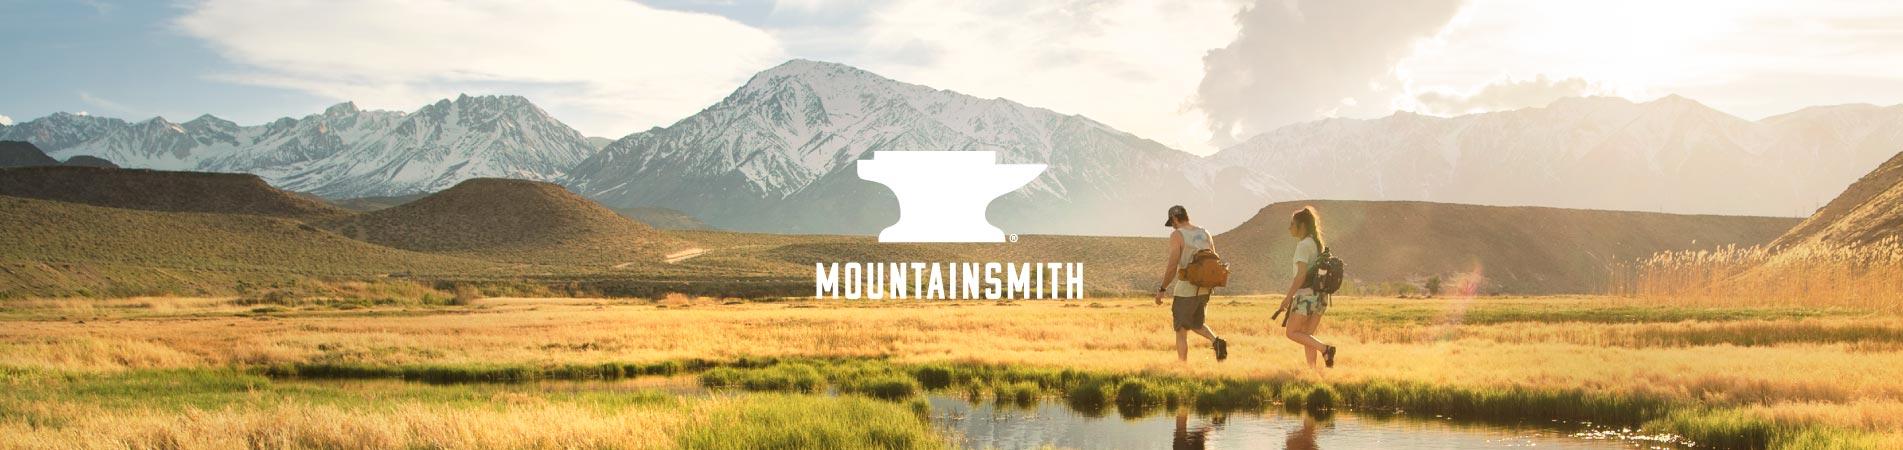 mountainsmith-summer.jpg